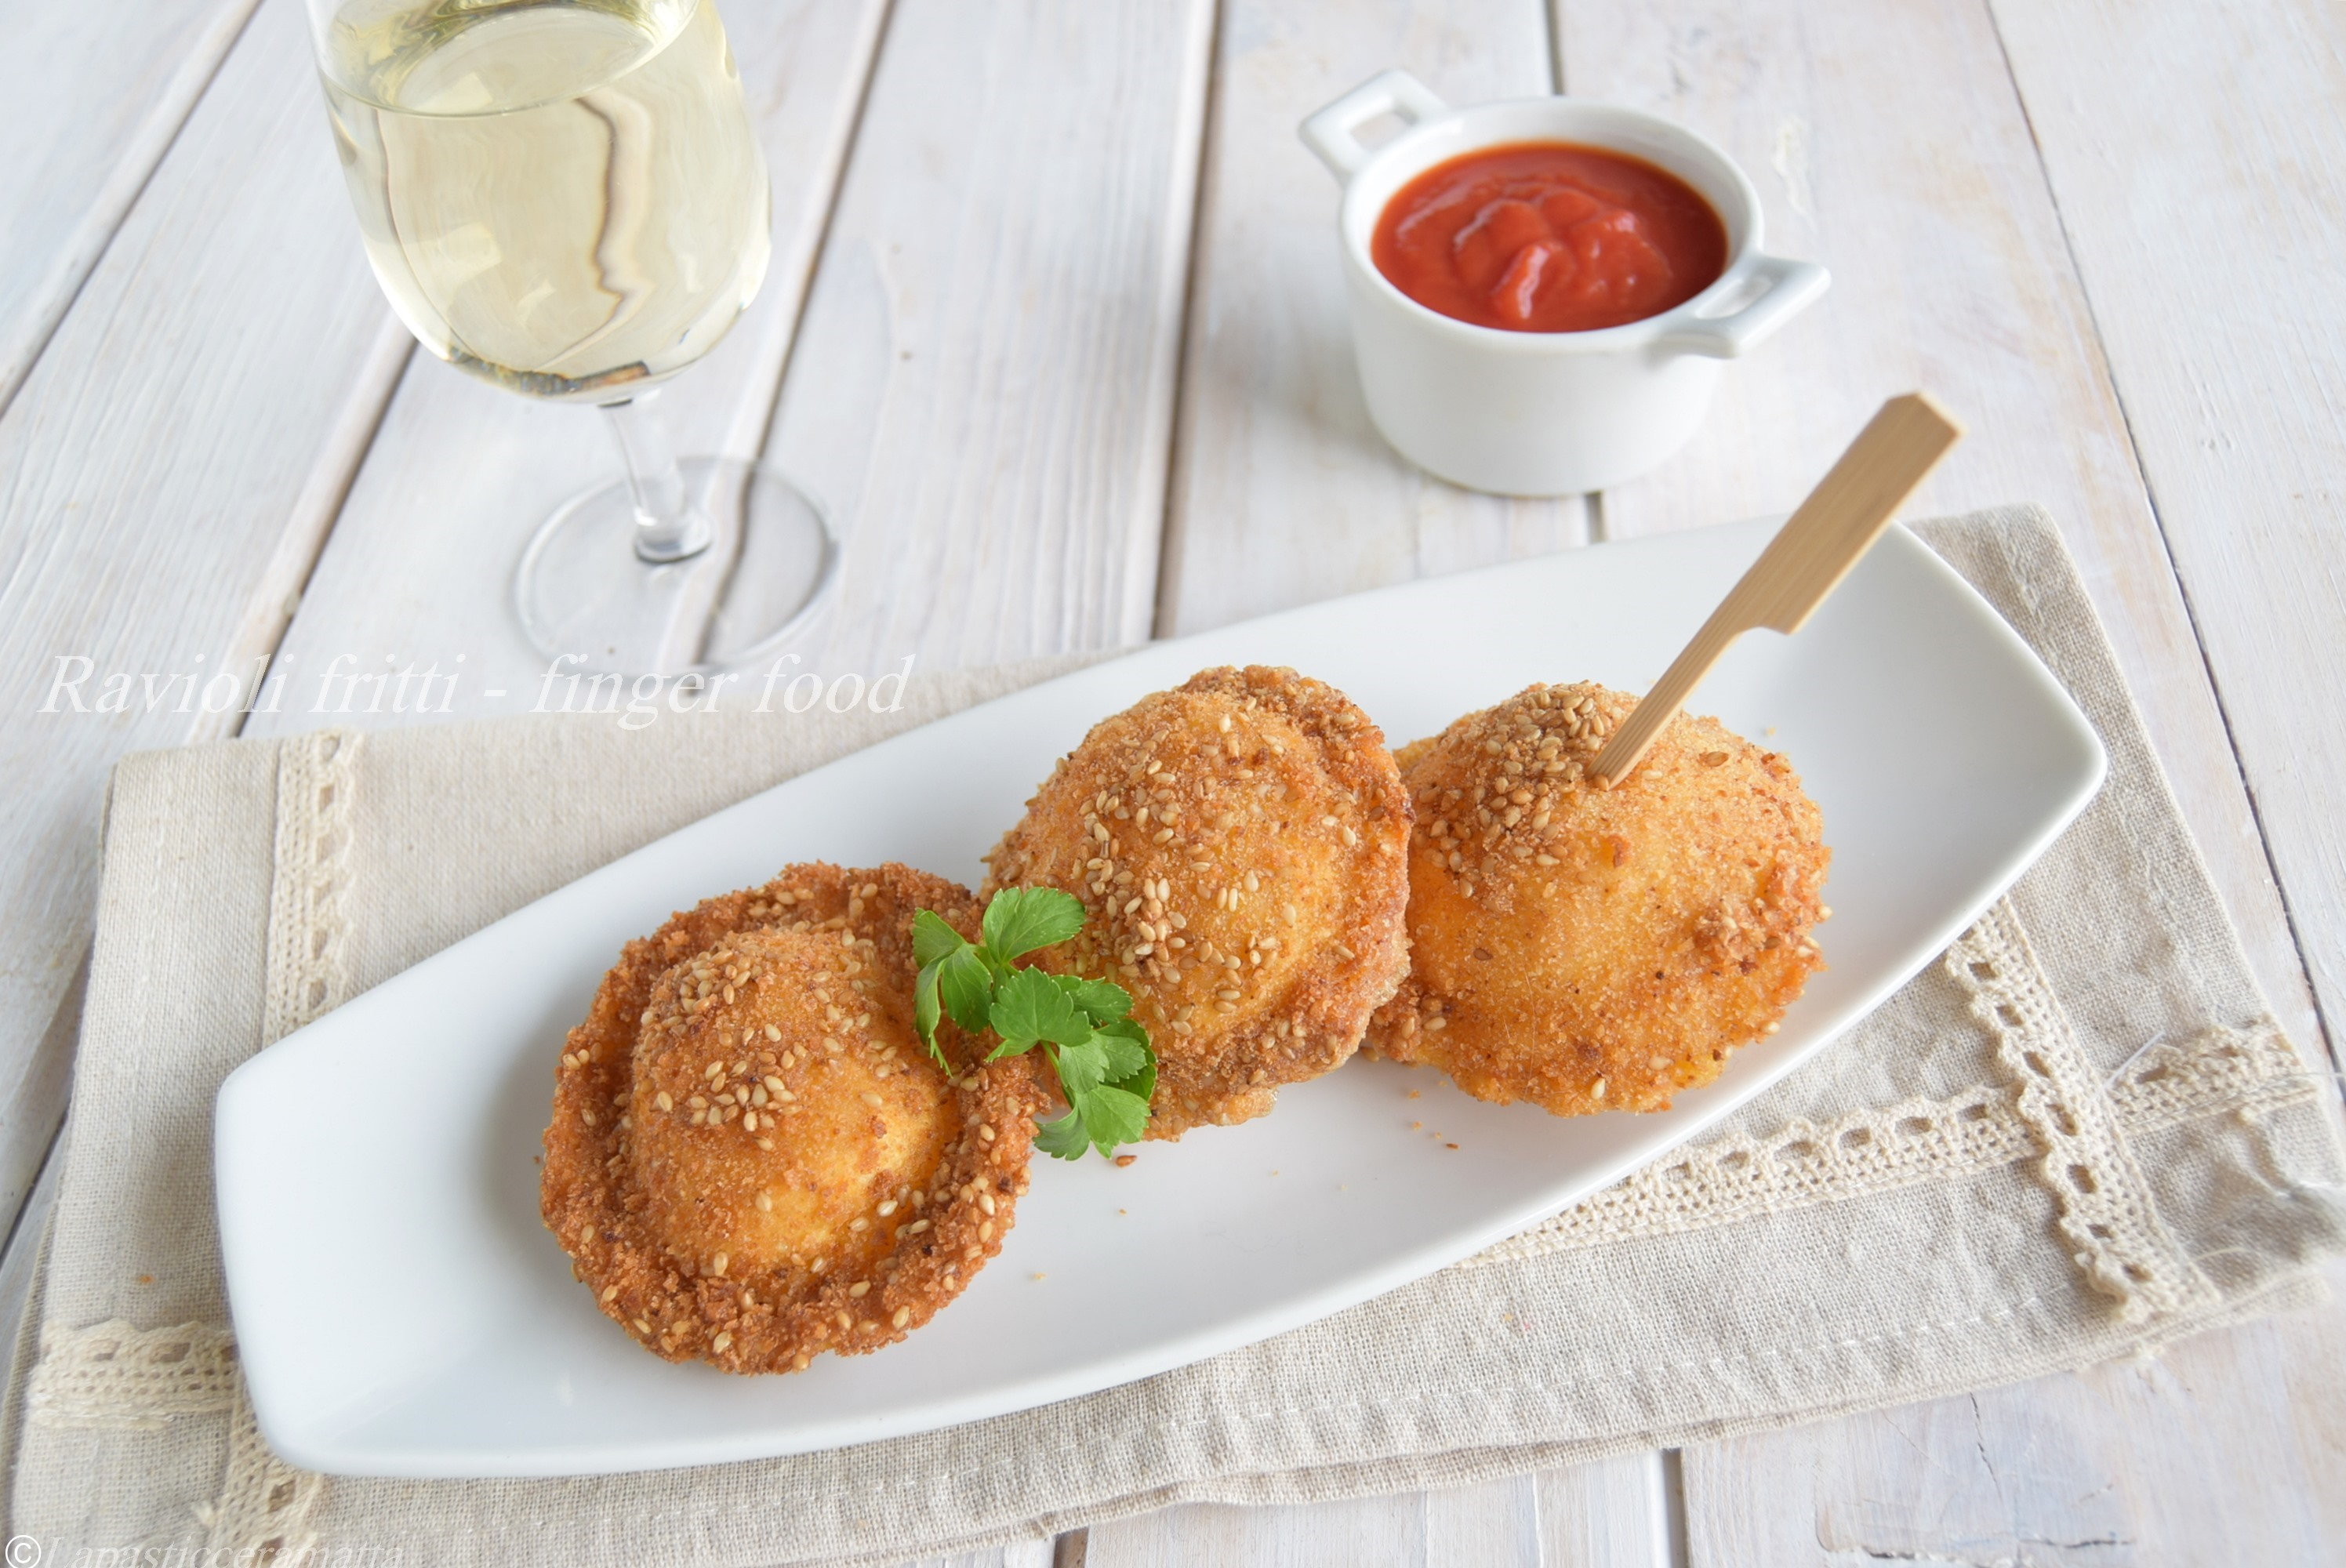 Ravioli fritti - finger food